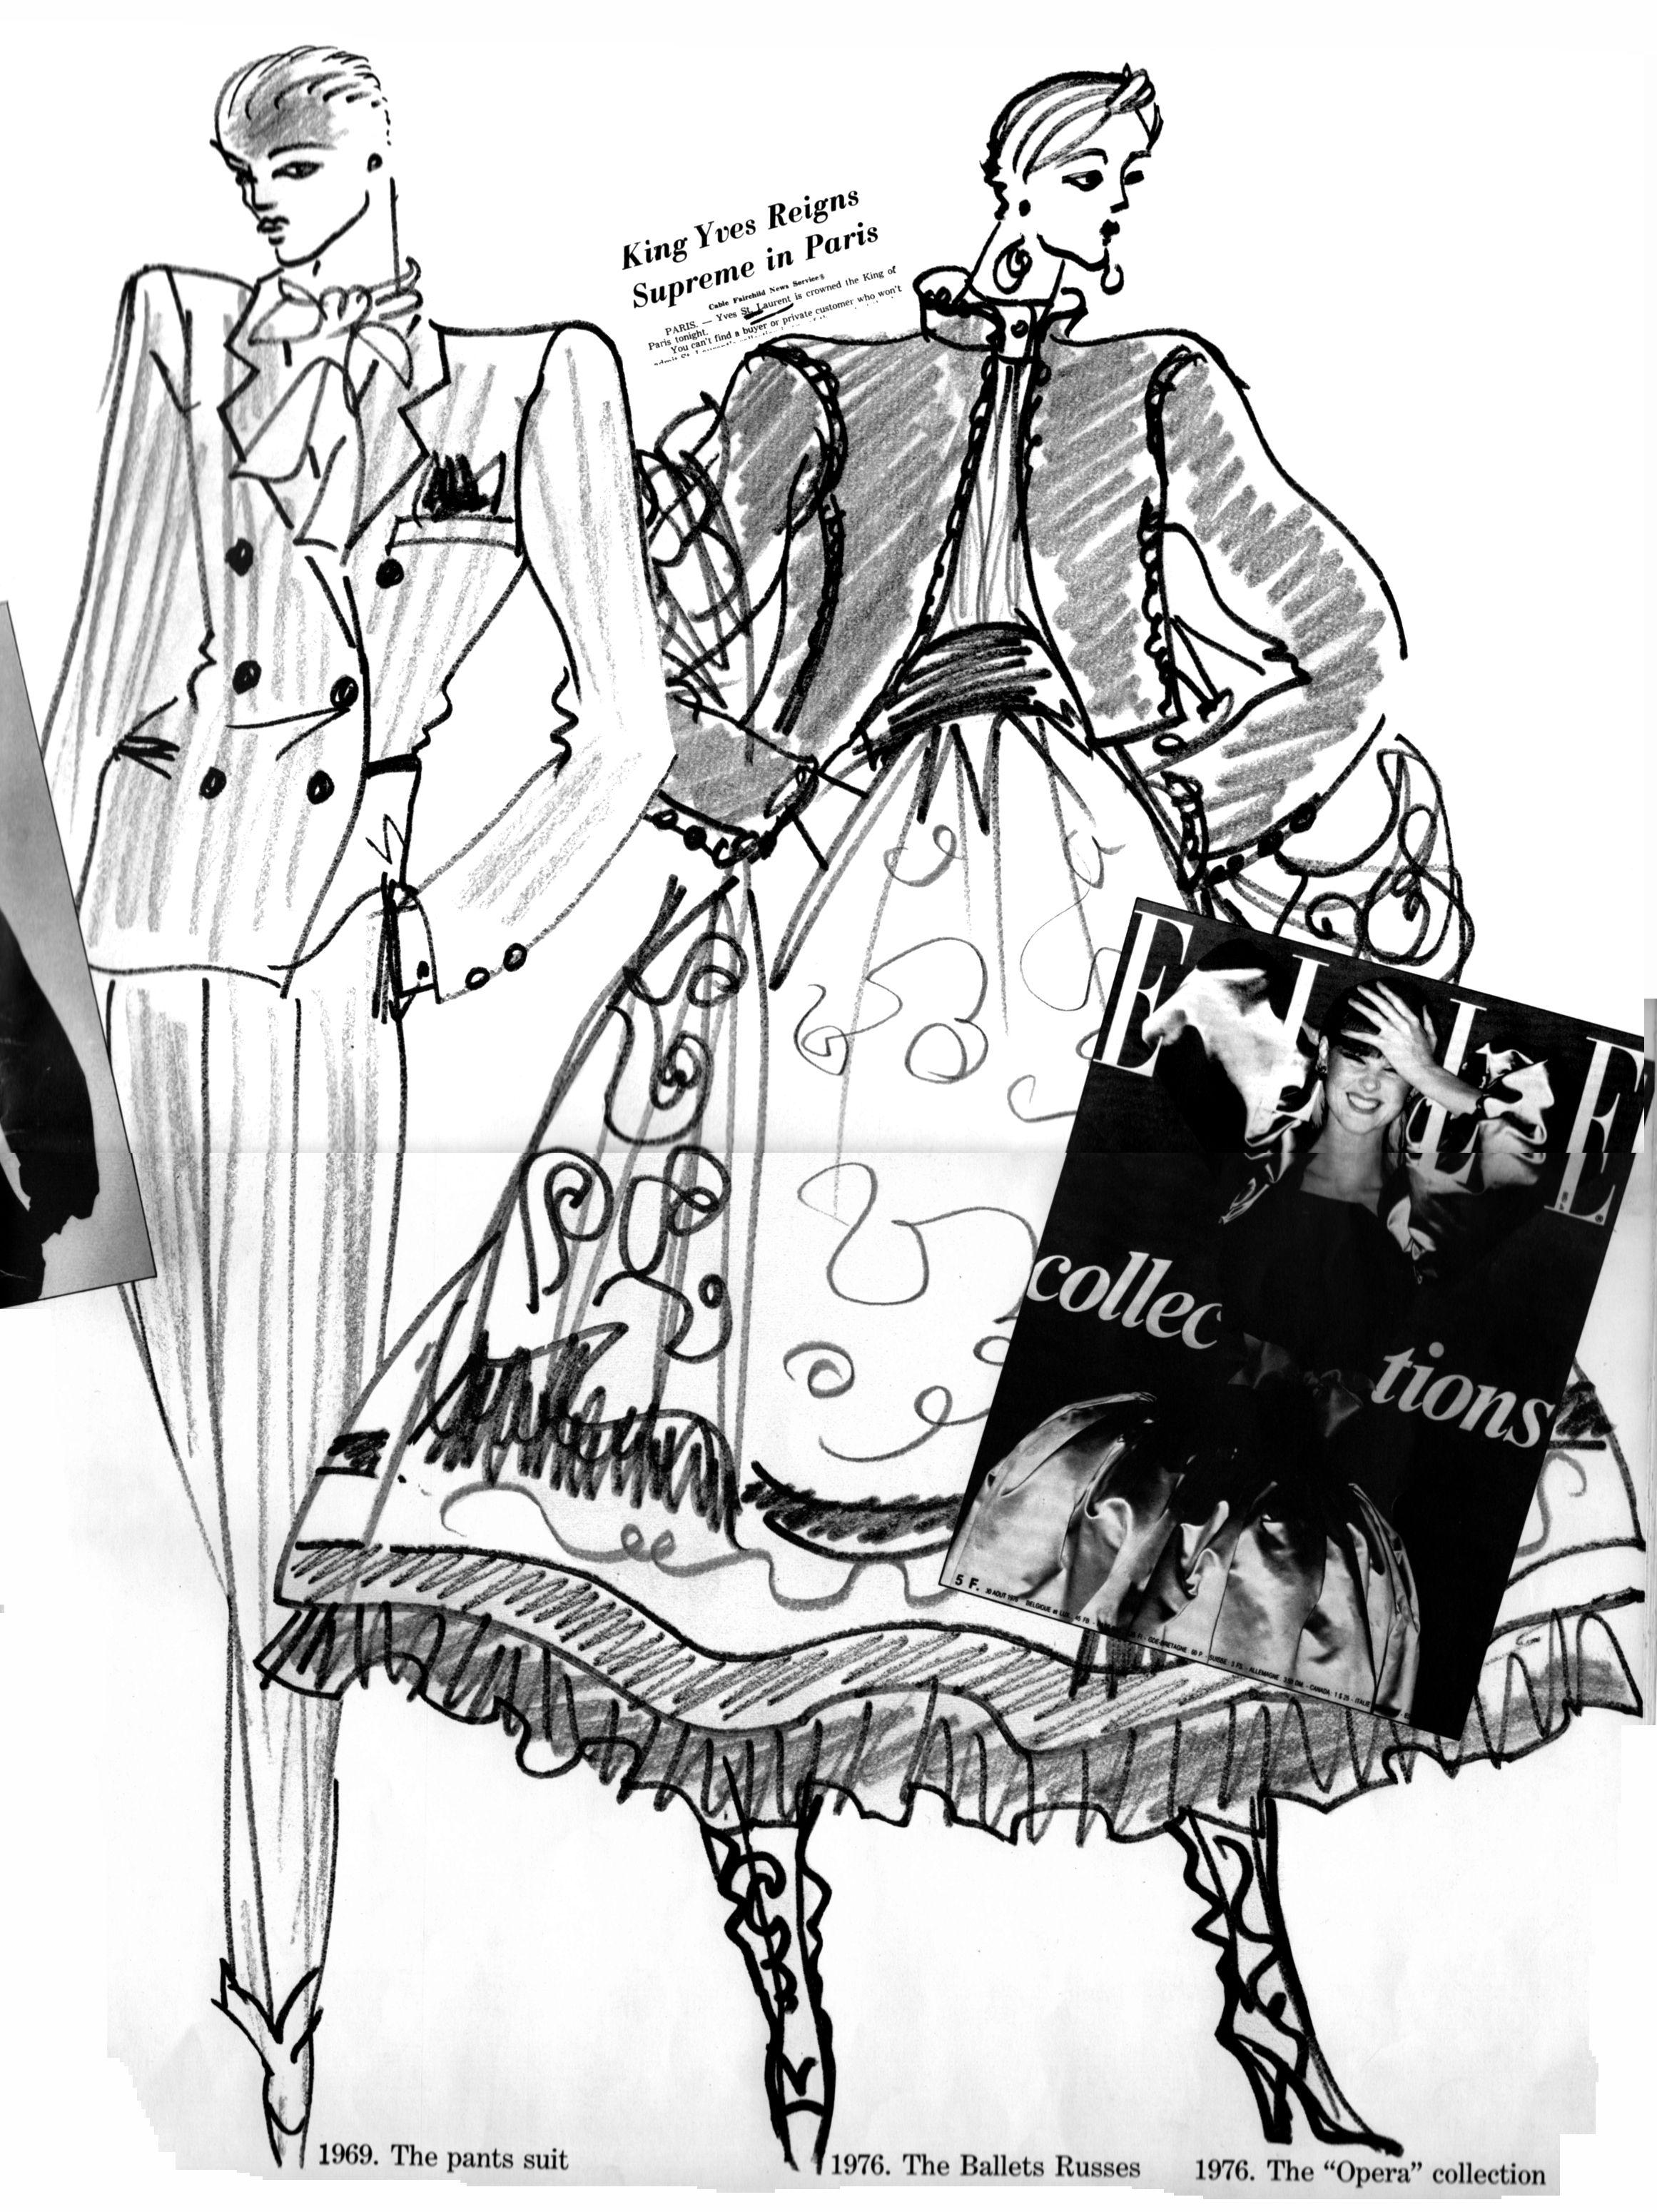 yves saint laurent from the hand of the designer pinterest Clothing Sketches for Girls yves saint laurent ysl saint laurent saint laurent rive gauche fashion illustration tutorial